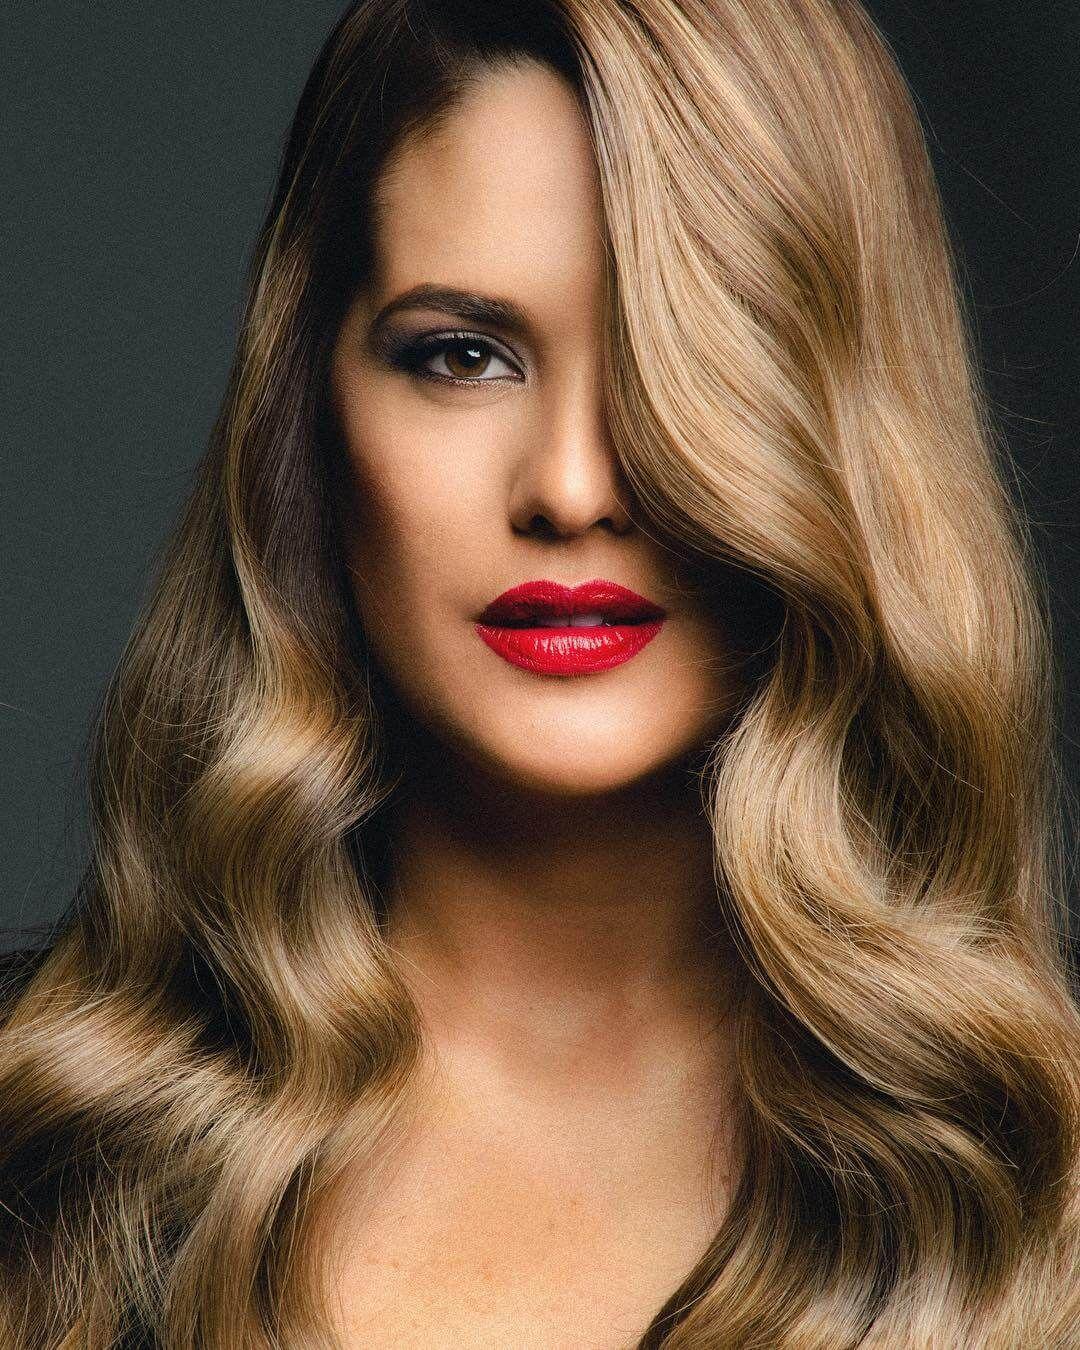 Image result for beautiful venezuelan women